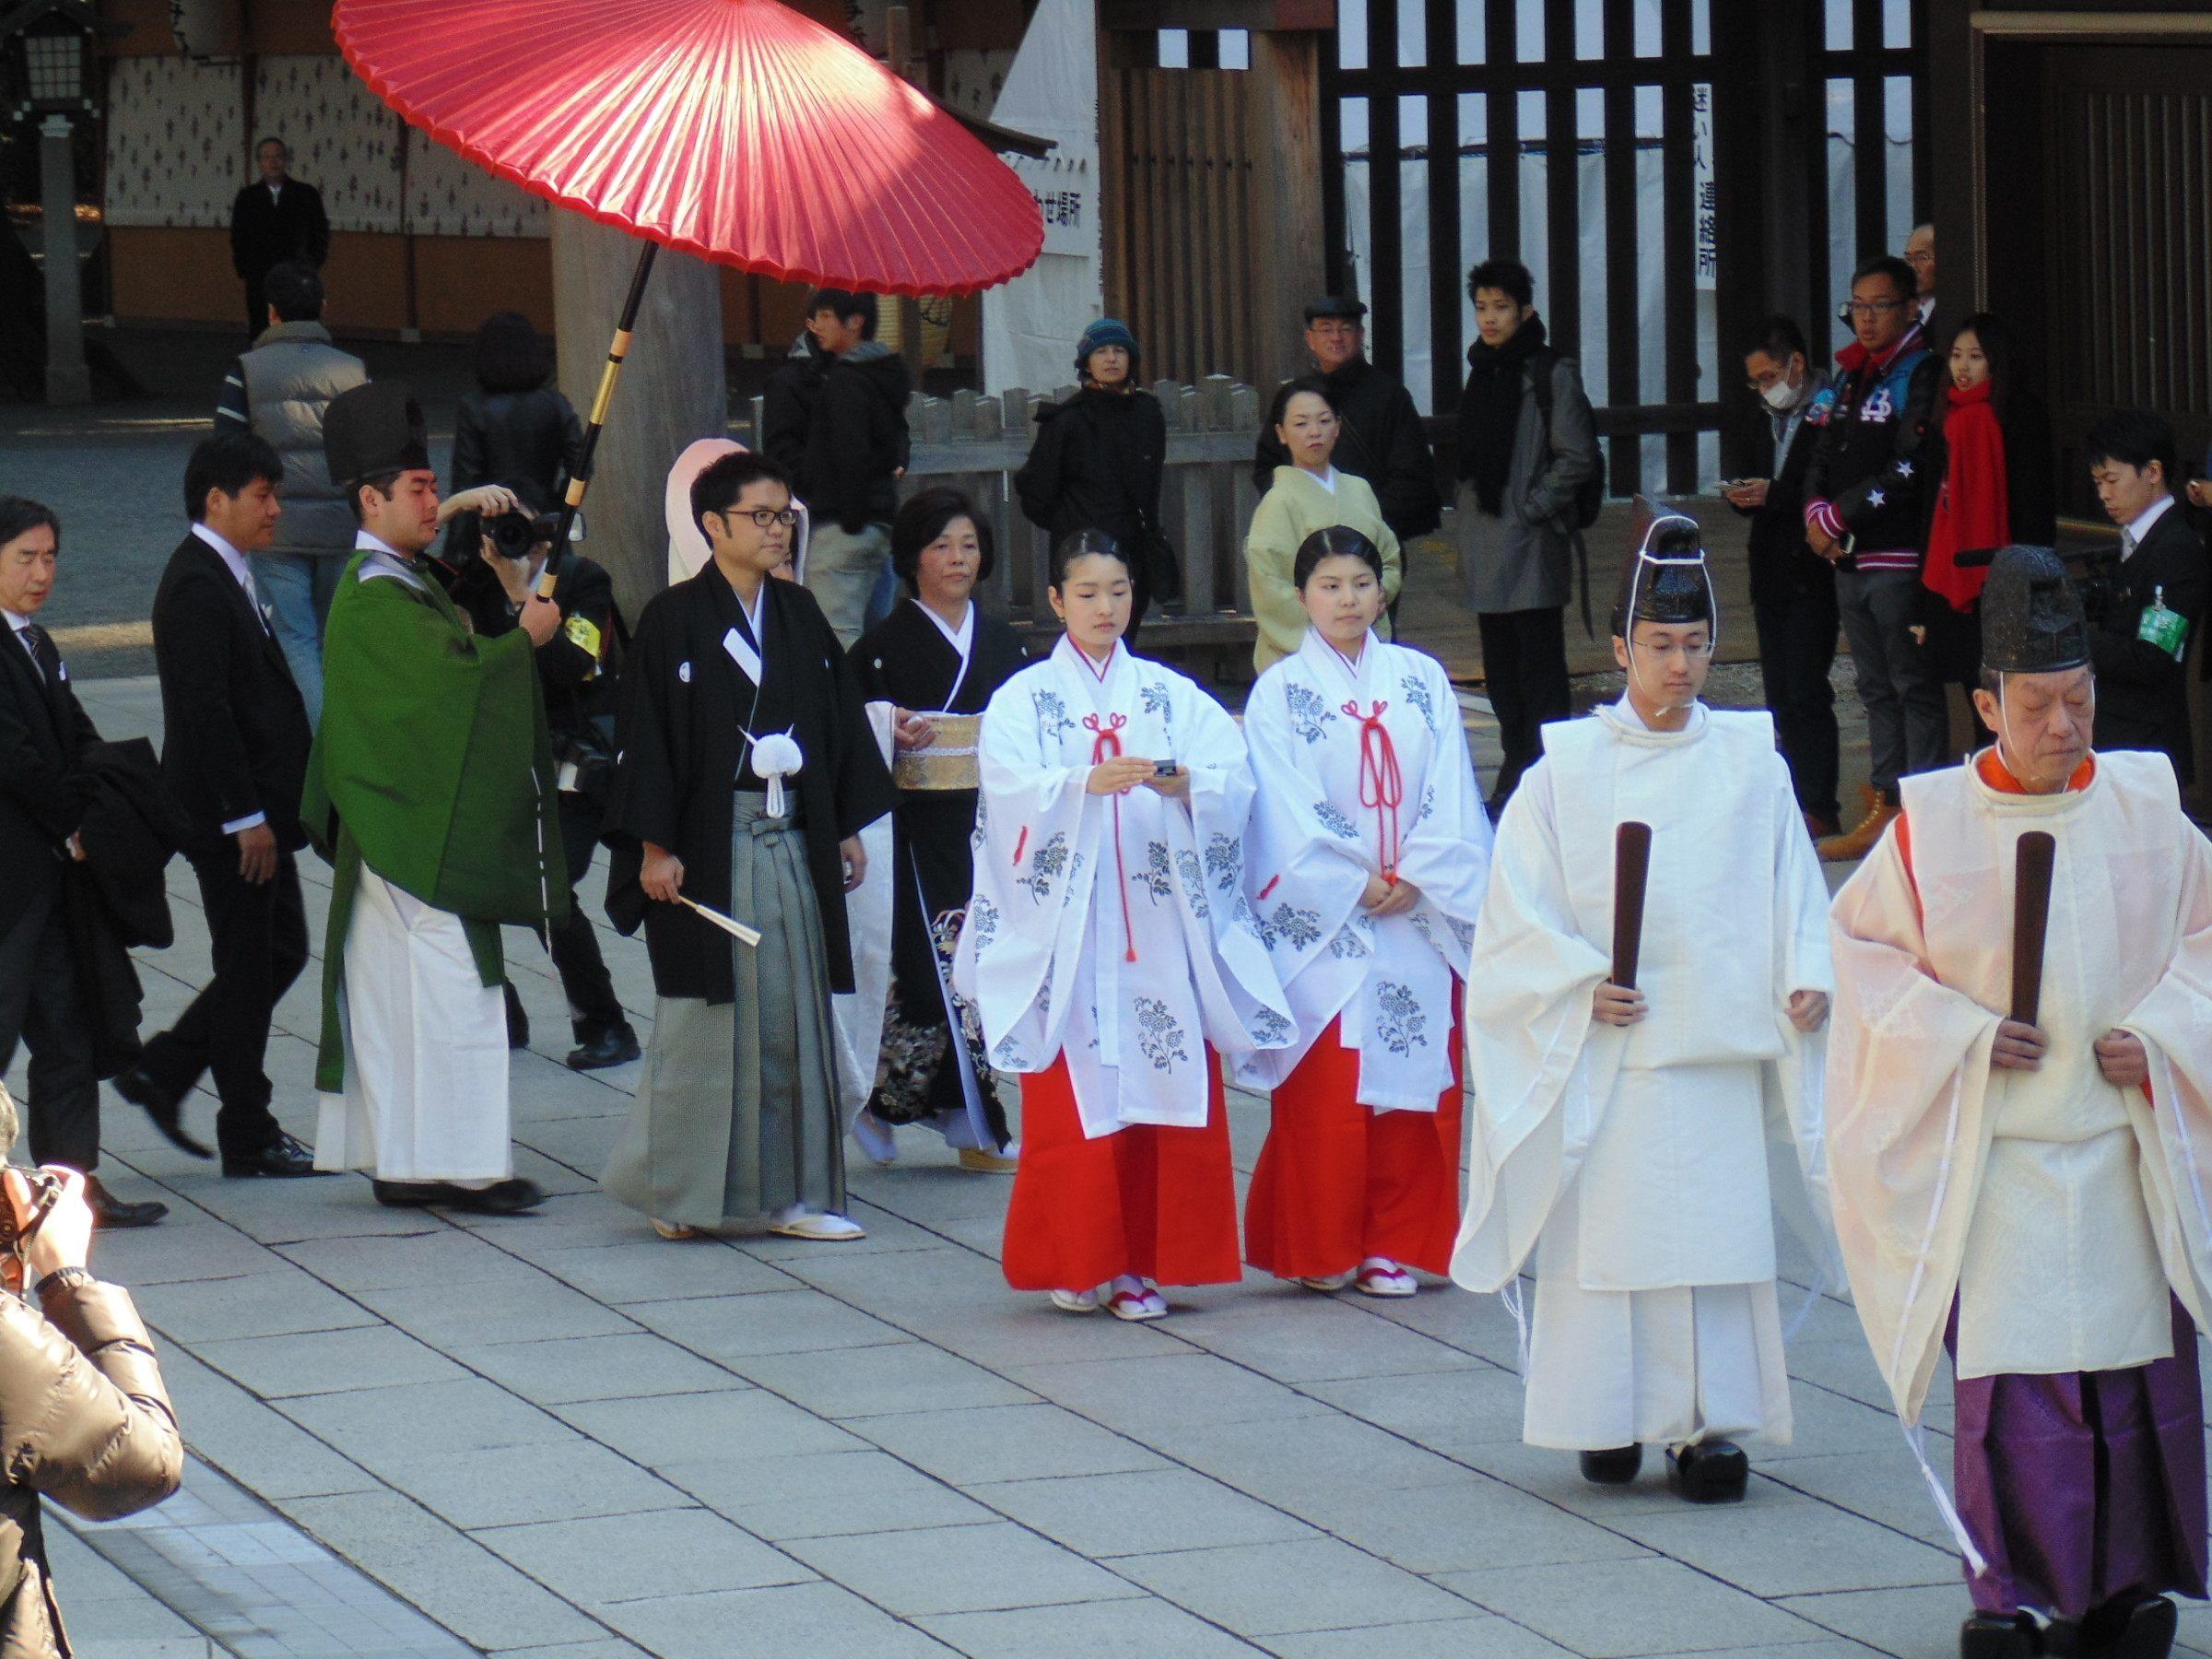 Shinto wedding ceremony at Tokyo's Meiji Shrine